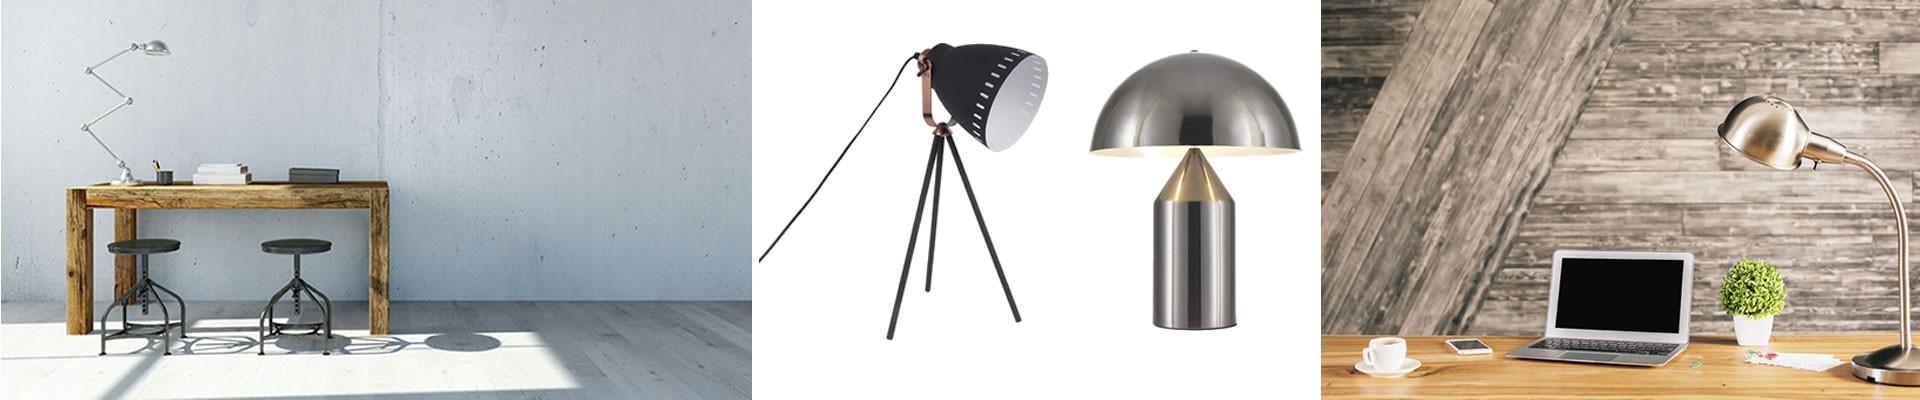 Desk Lamps | Desk & Work Lamps